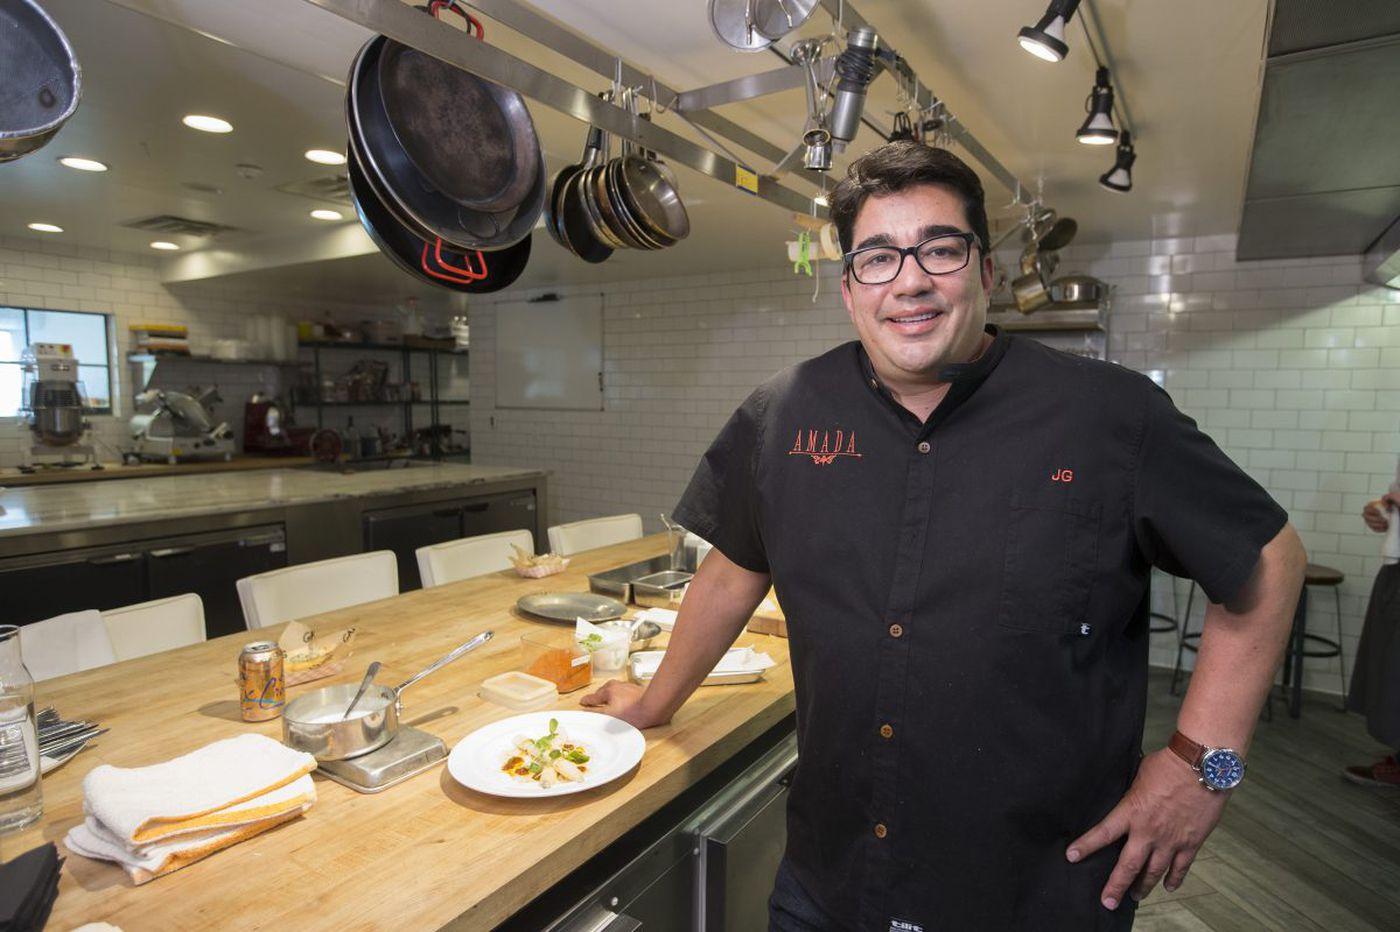 Chef Jose Garces and investors spar in court over bankruptcy bid